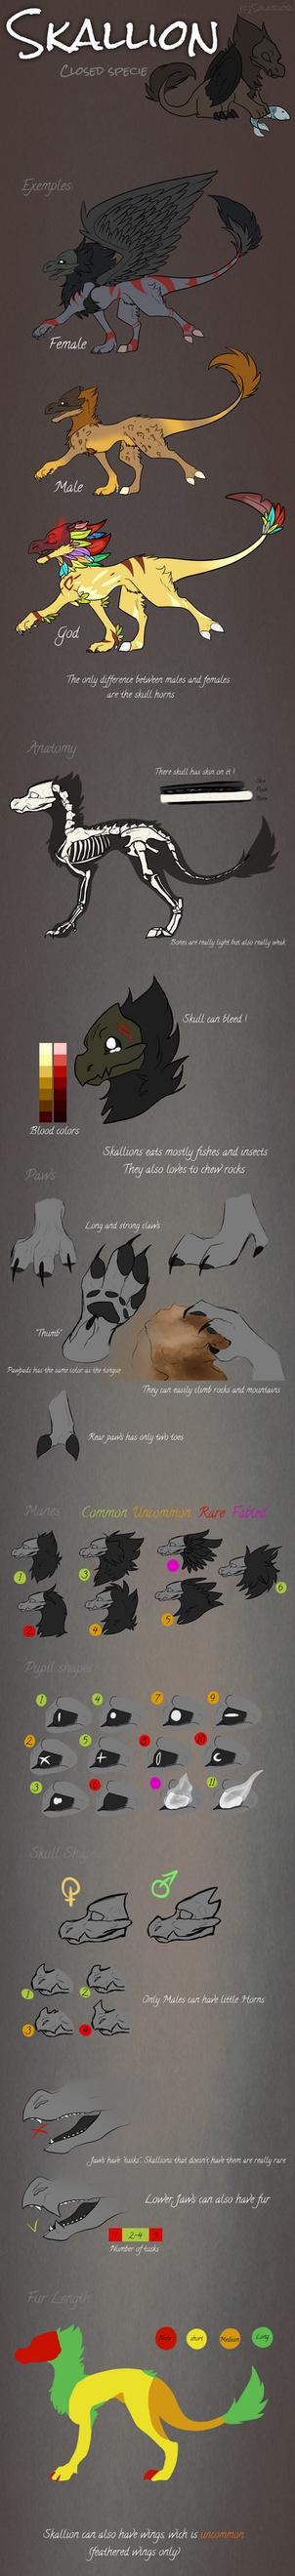 Skallion - Closed Specie Reference by Solariorr